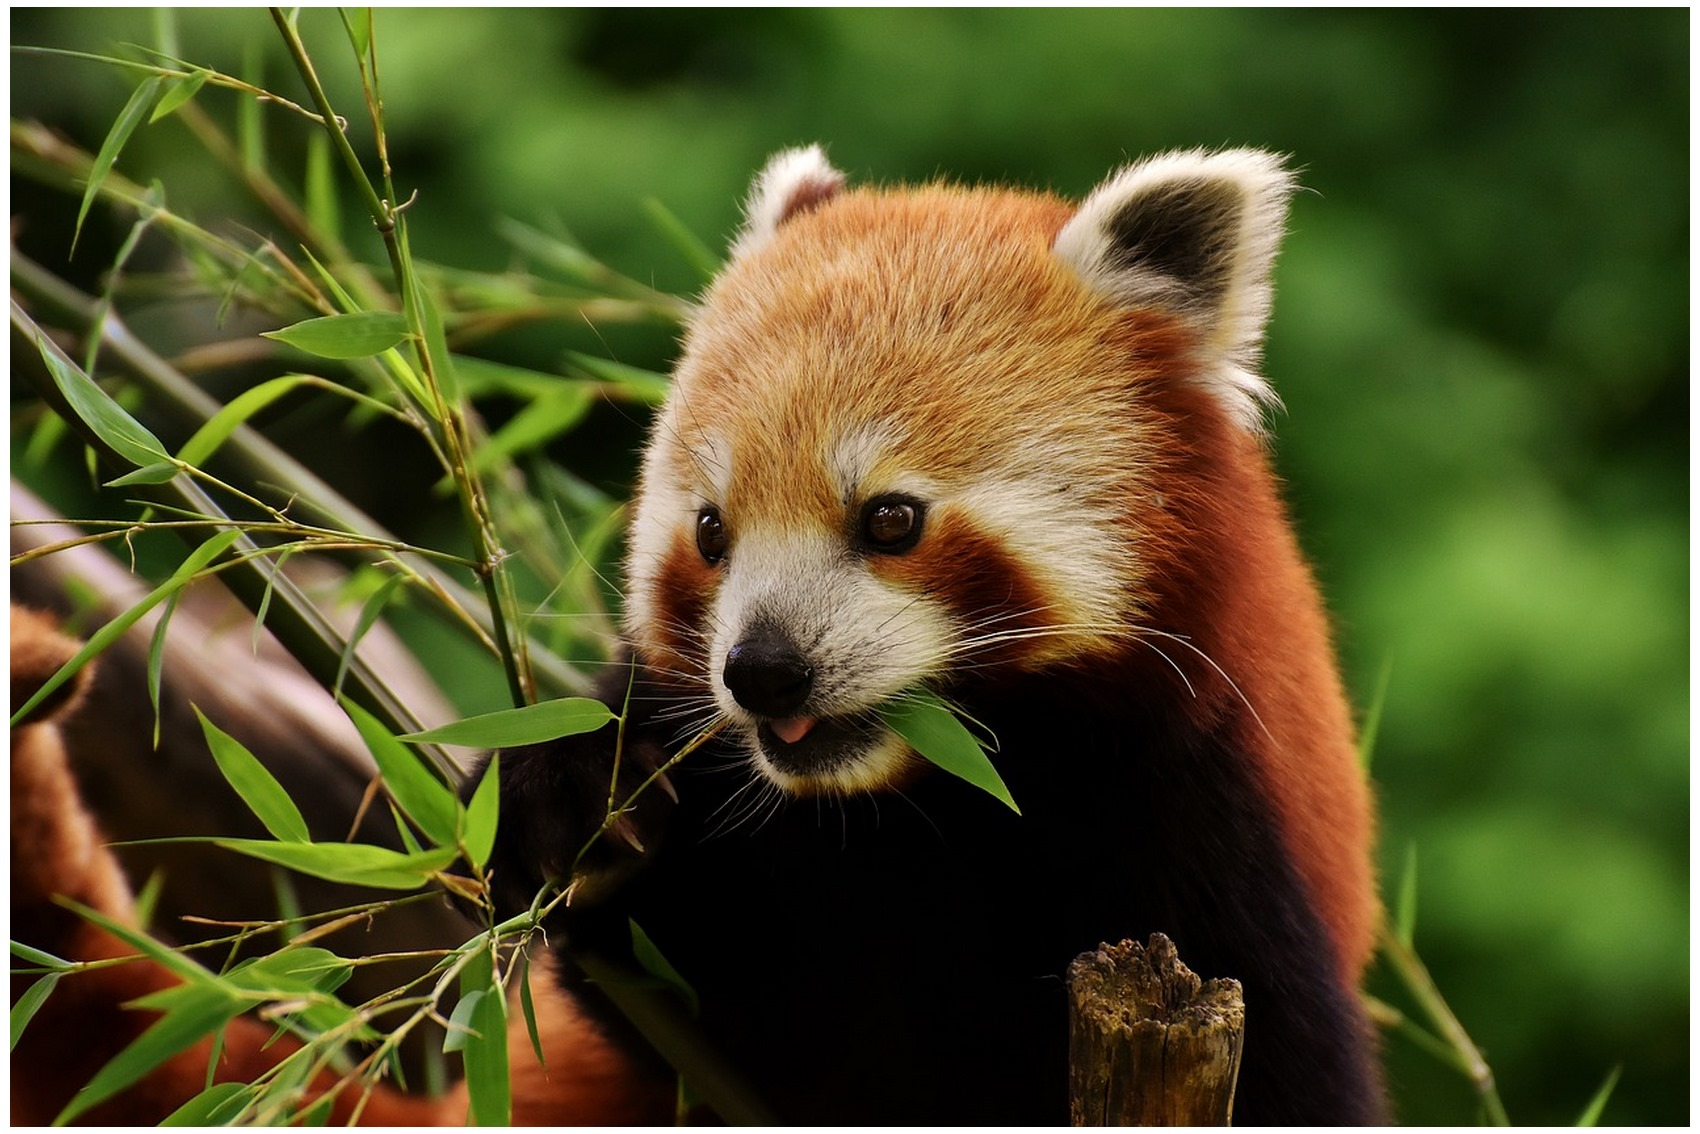 The favorite food of Giant panda information